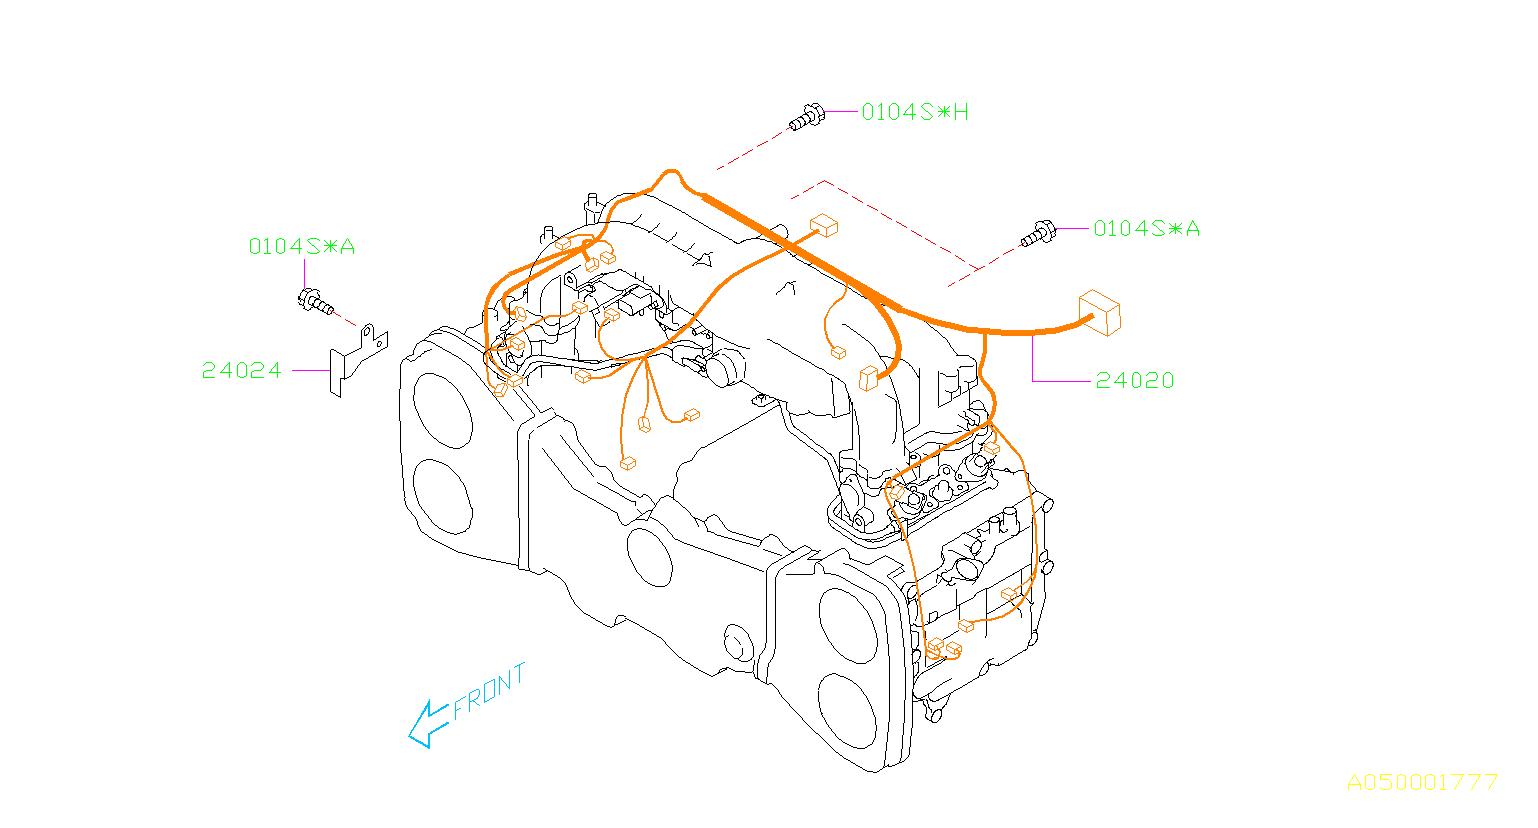 subaru forester harness engine wiring manifold intake. Black Bedroom Furniture Sets. Home Design Ideas